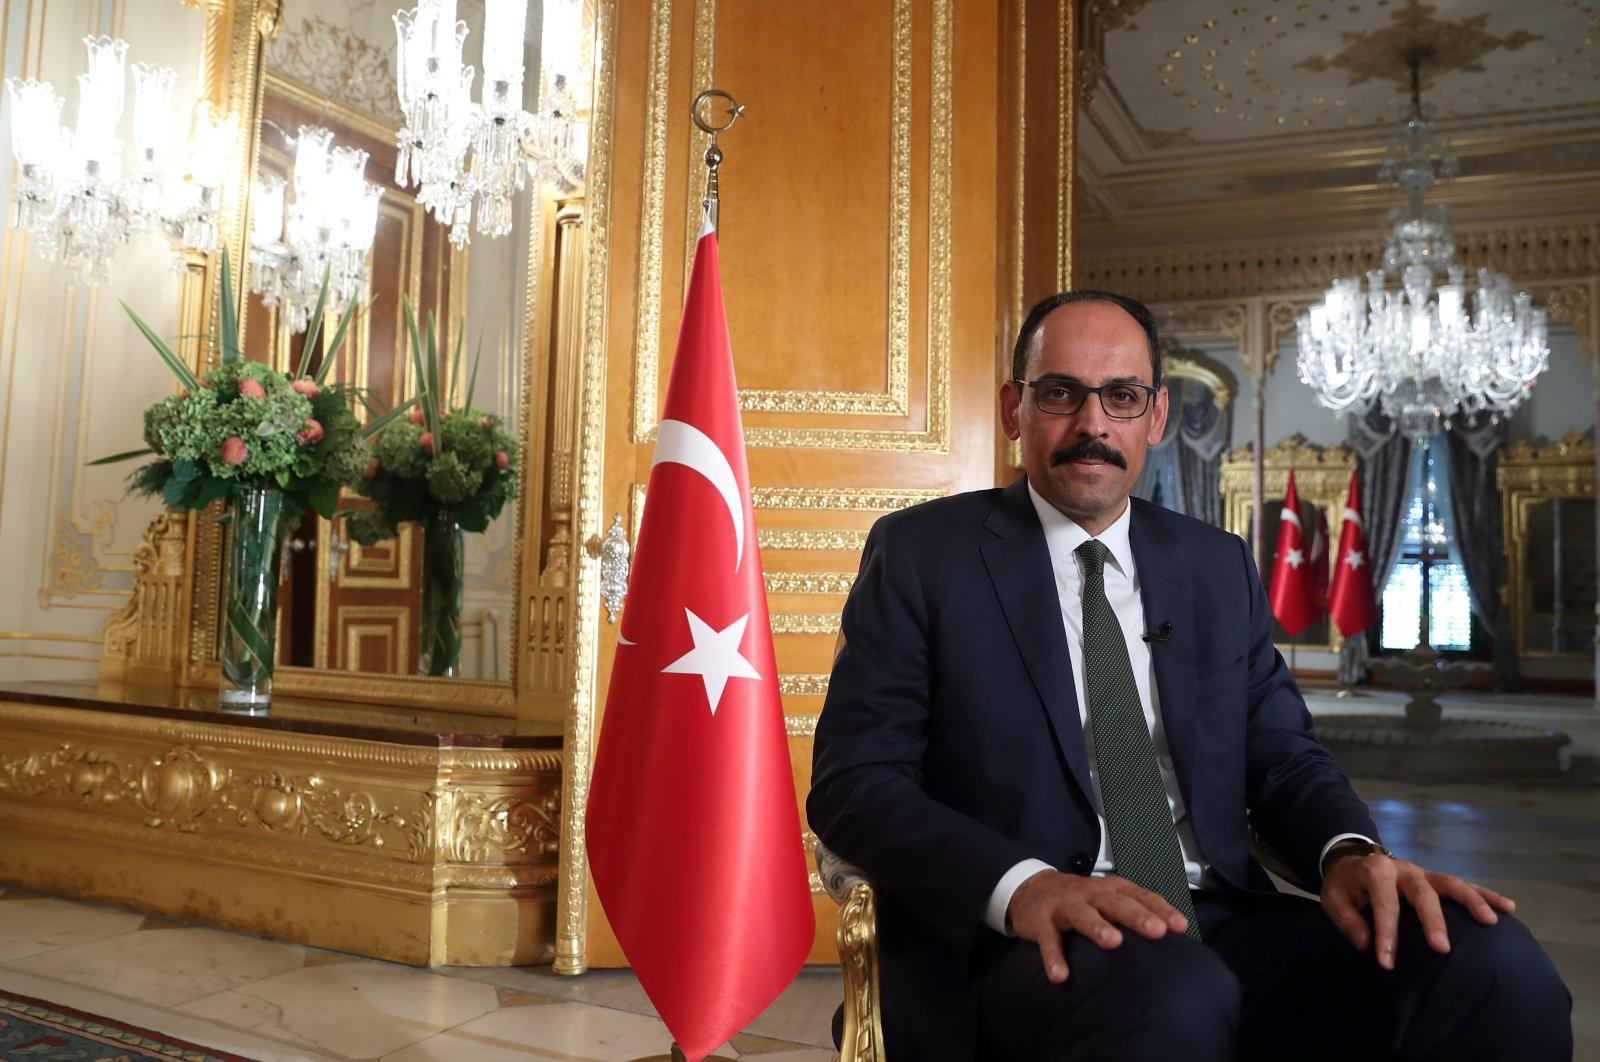 Turkey's presidential spokespersonIbrahim Kalın is pictured during an interview in Istanbul, Turkey, Sept. 27, 2020. (REUTERS Photo)